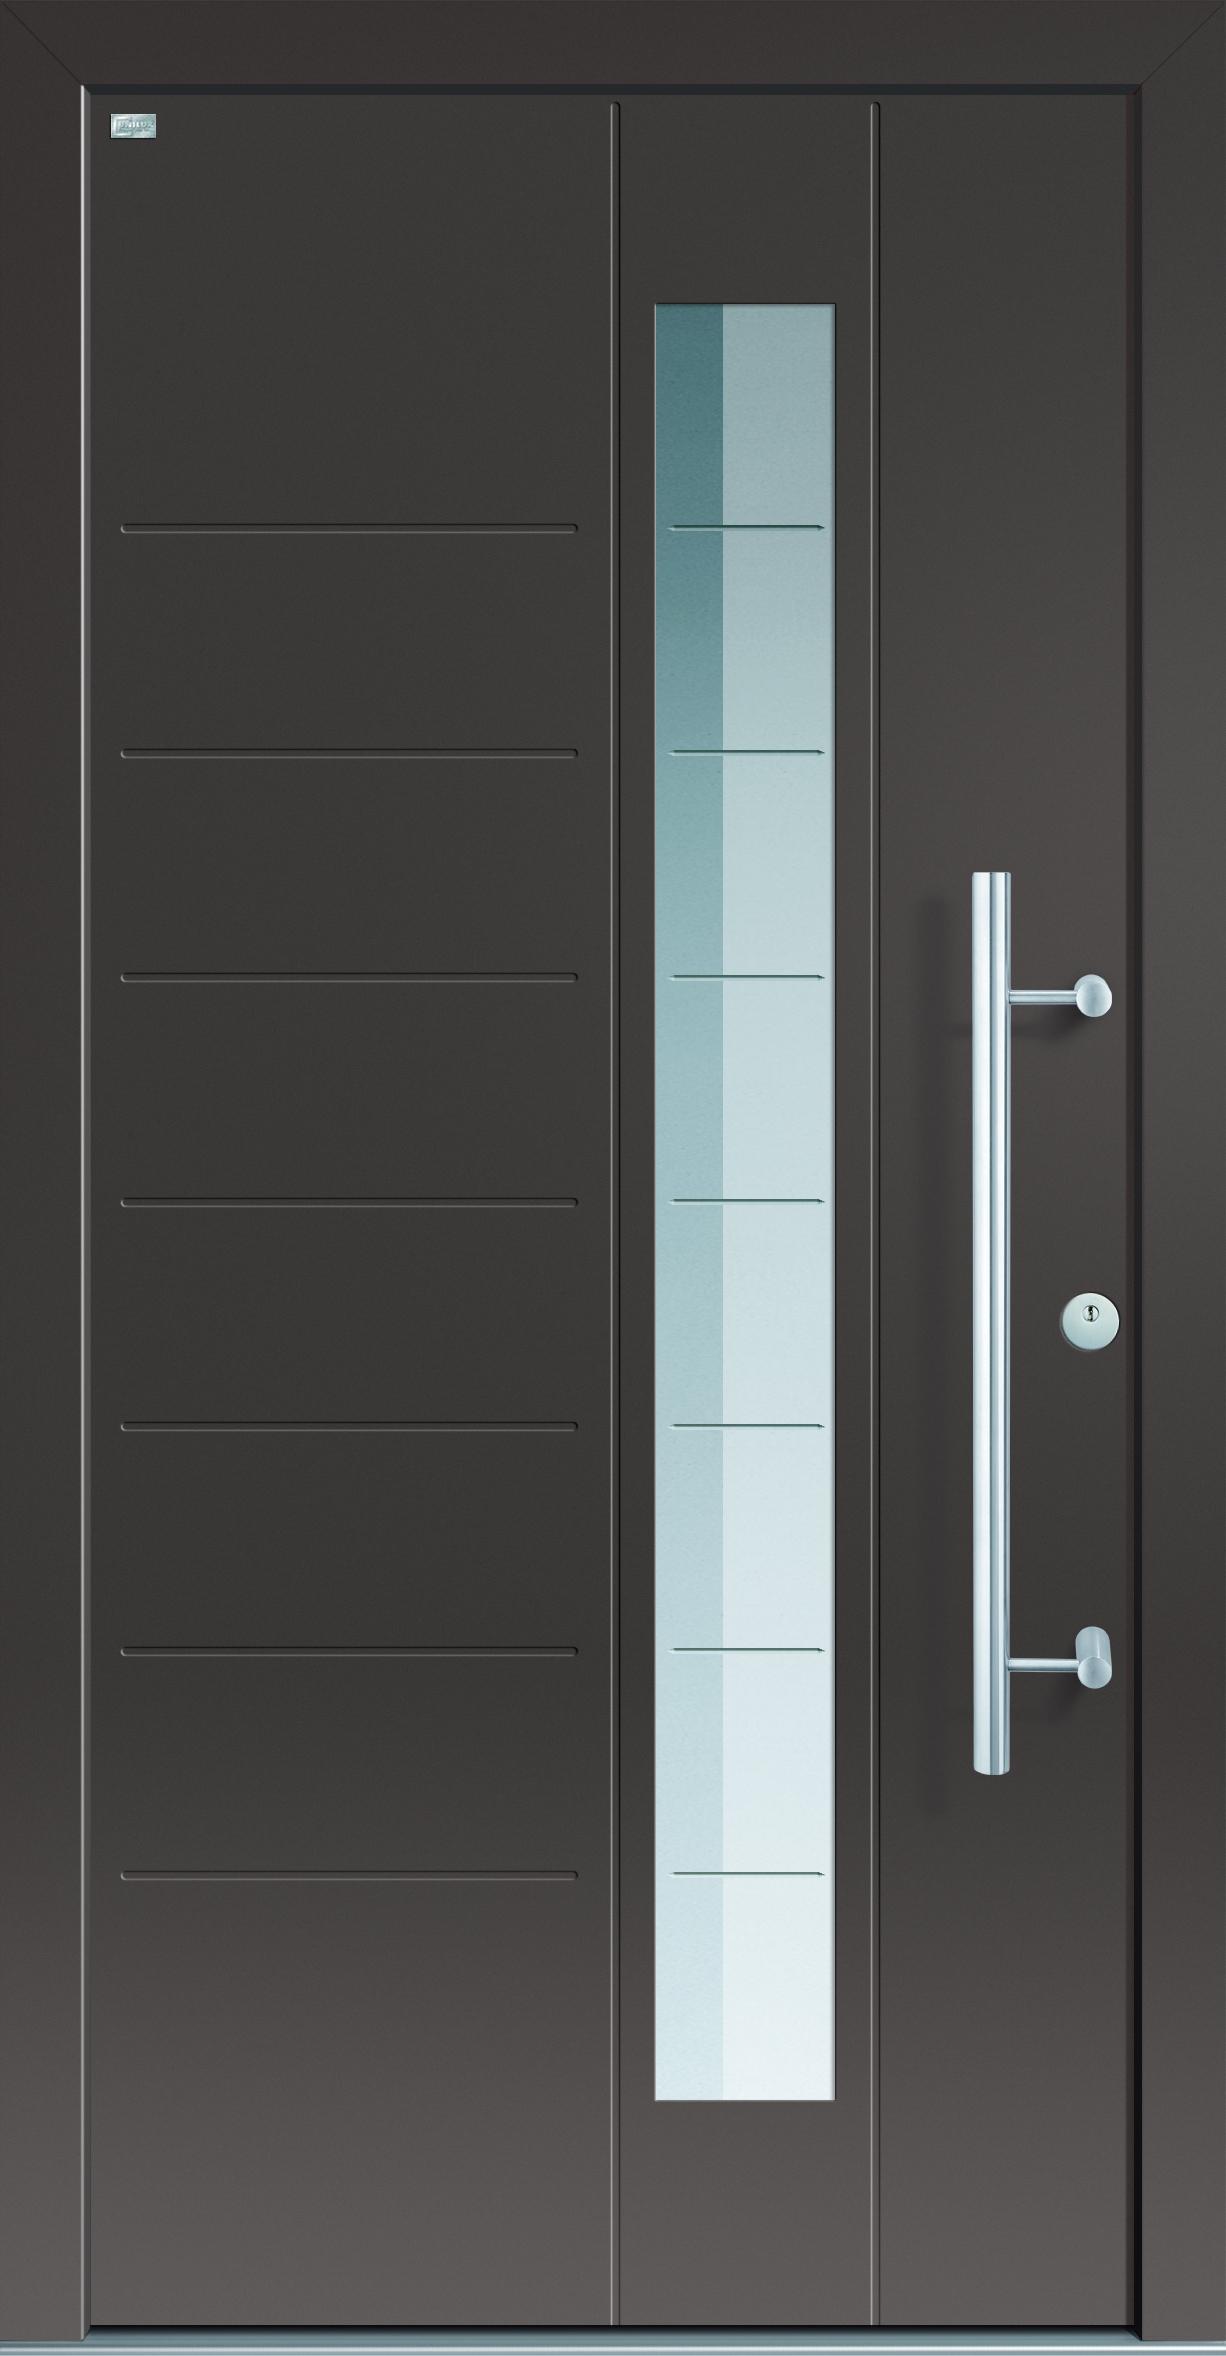 holz aluminium haust ren richter bauelemente gmbh. Black Bedroom Furniture Sets. Home Design Ideas